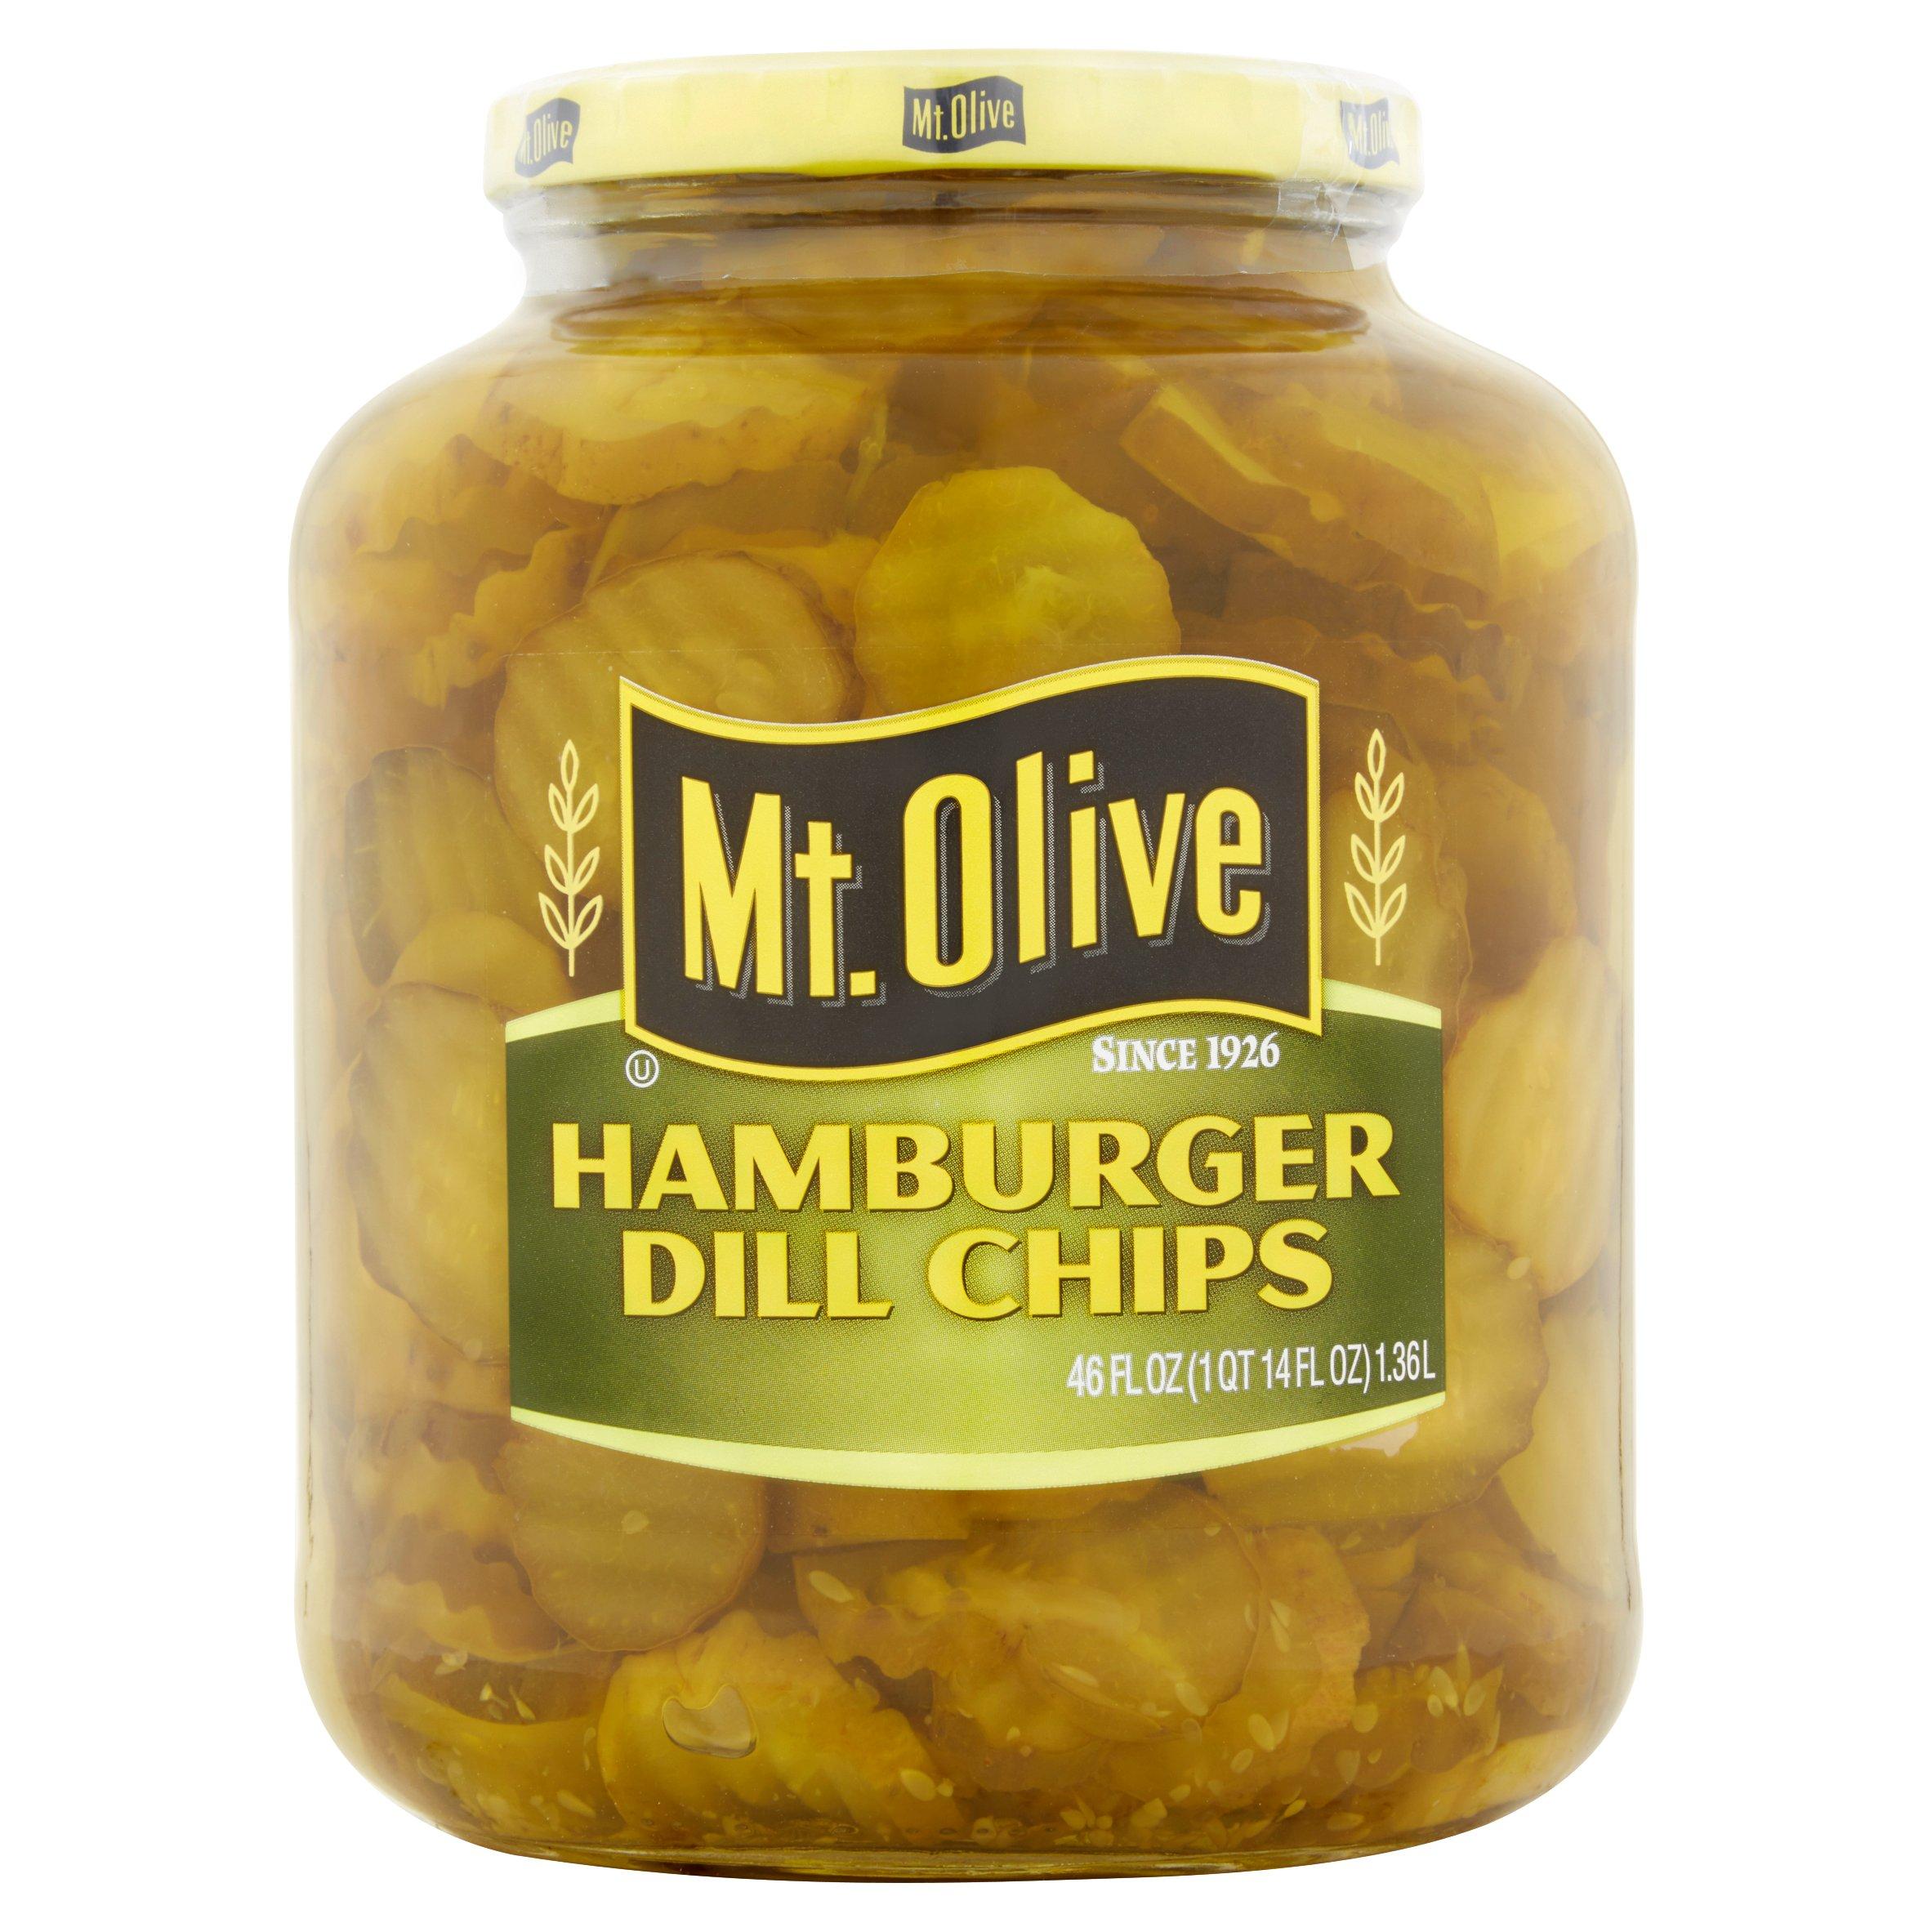 Mt. Olive Hamburger Dill Chips Pickles, 46 oz by Mt. Olive Pickle Company, Inc / Corner of Cucumber & Vine